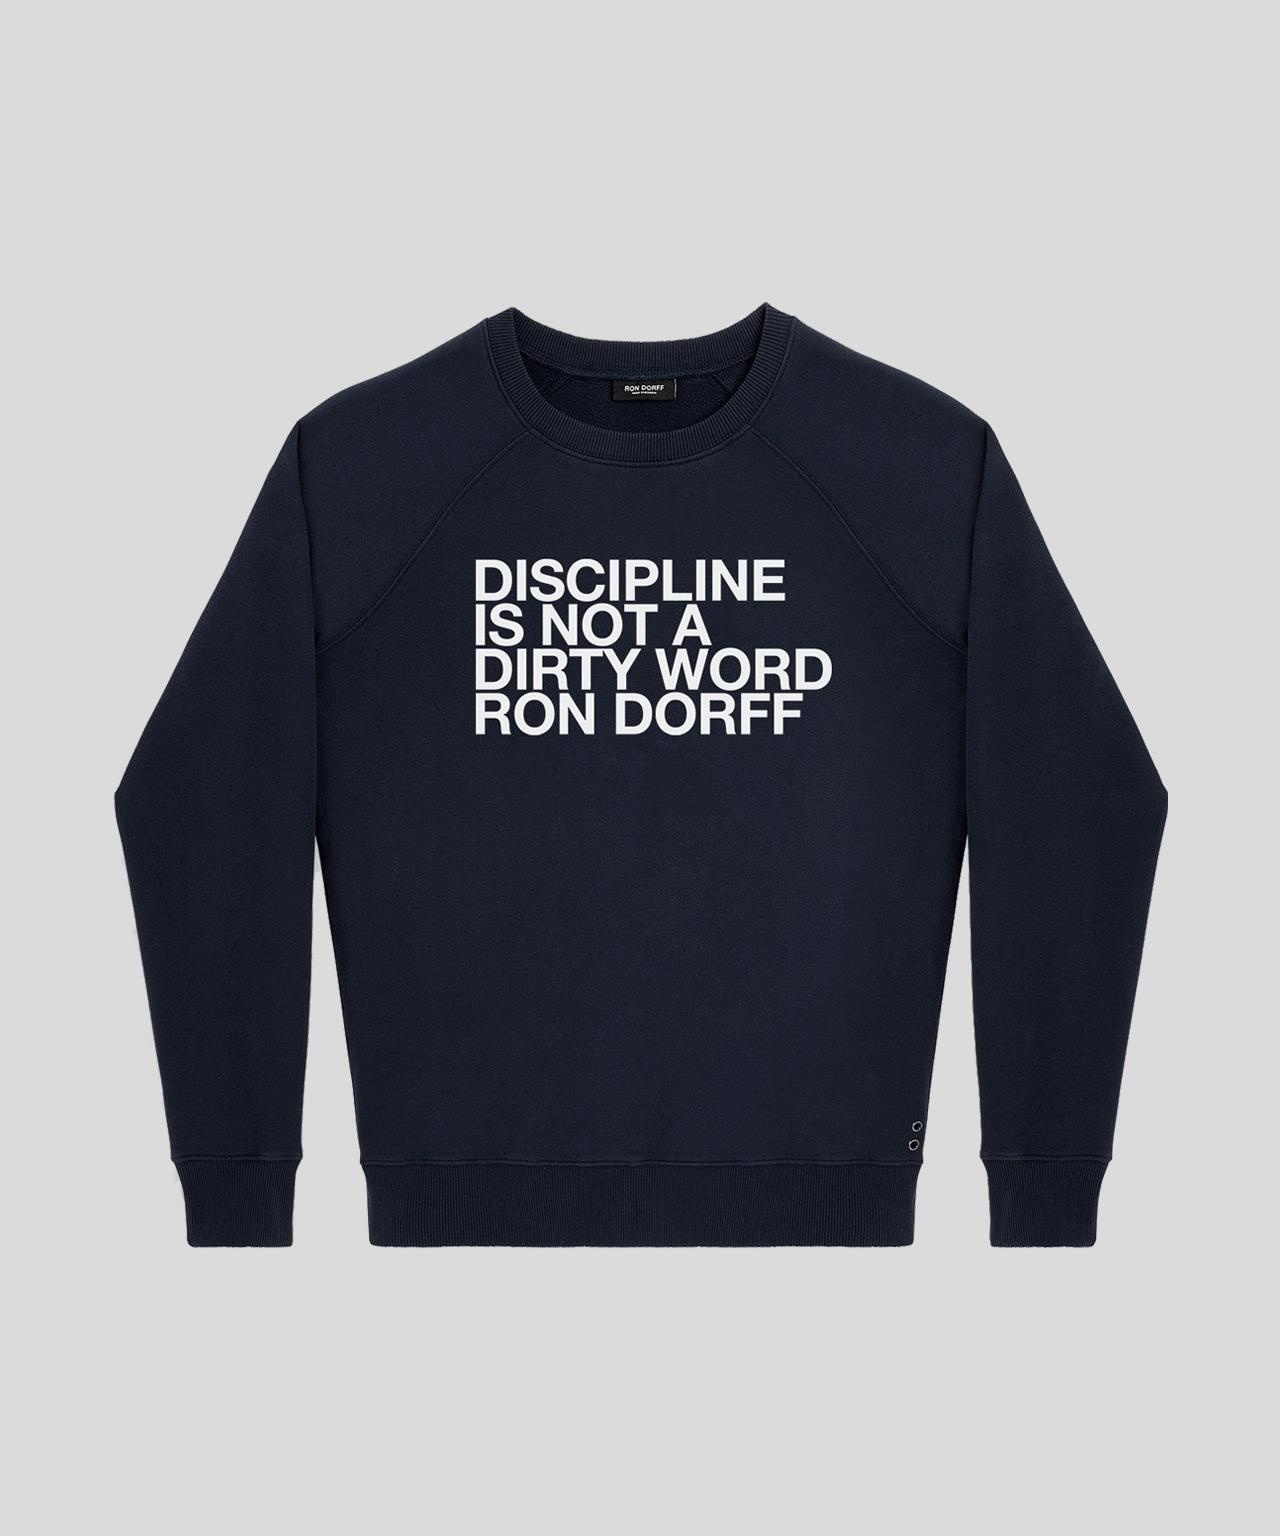 Ron Dorff DISCIPLINE sweatshirt (brushed)